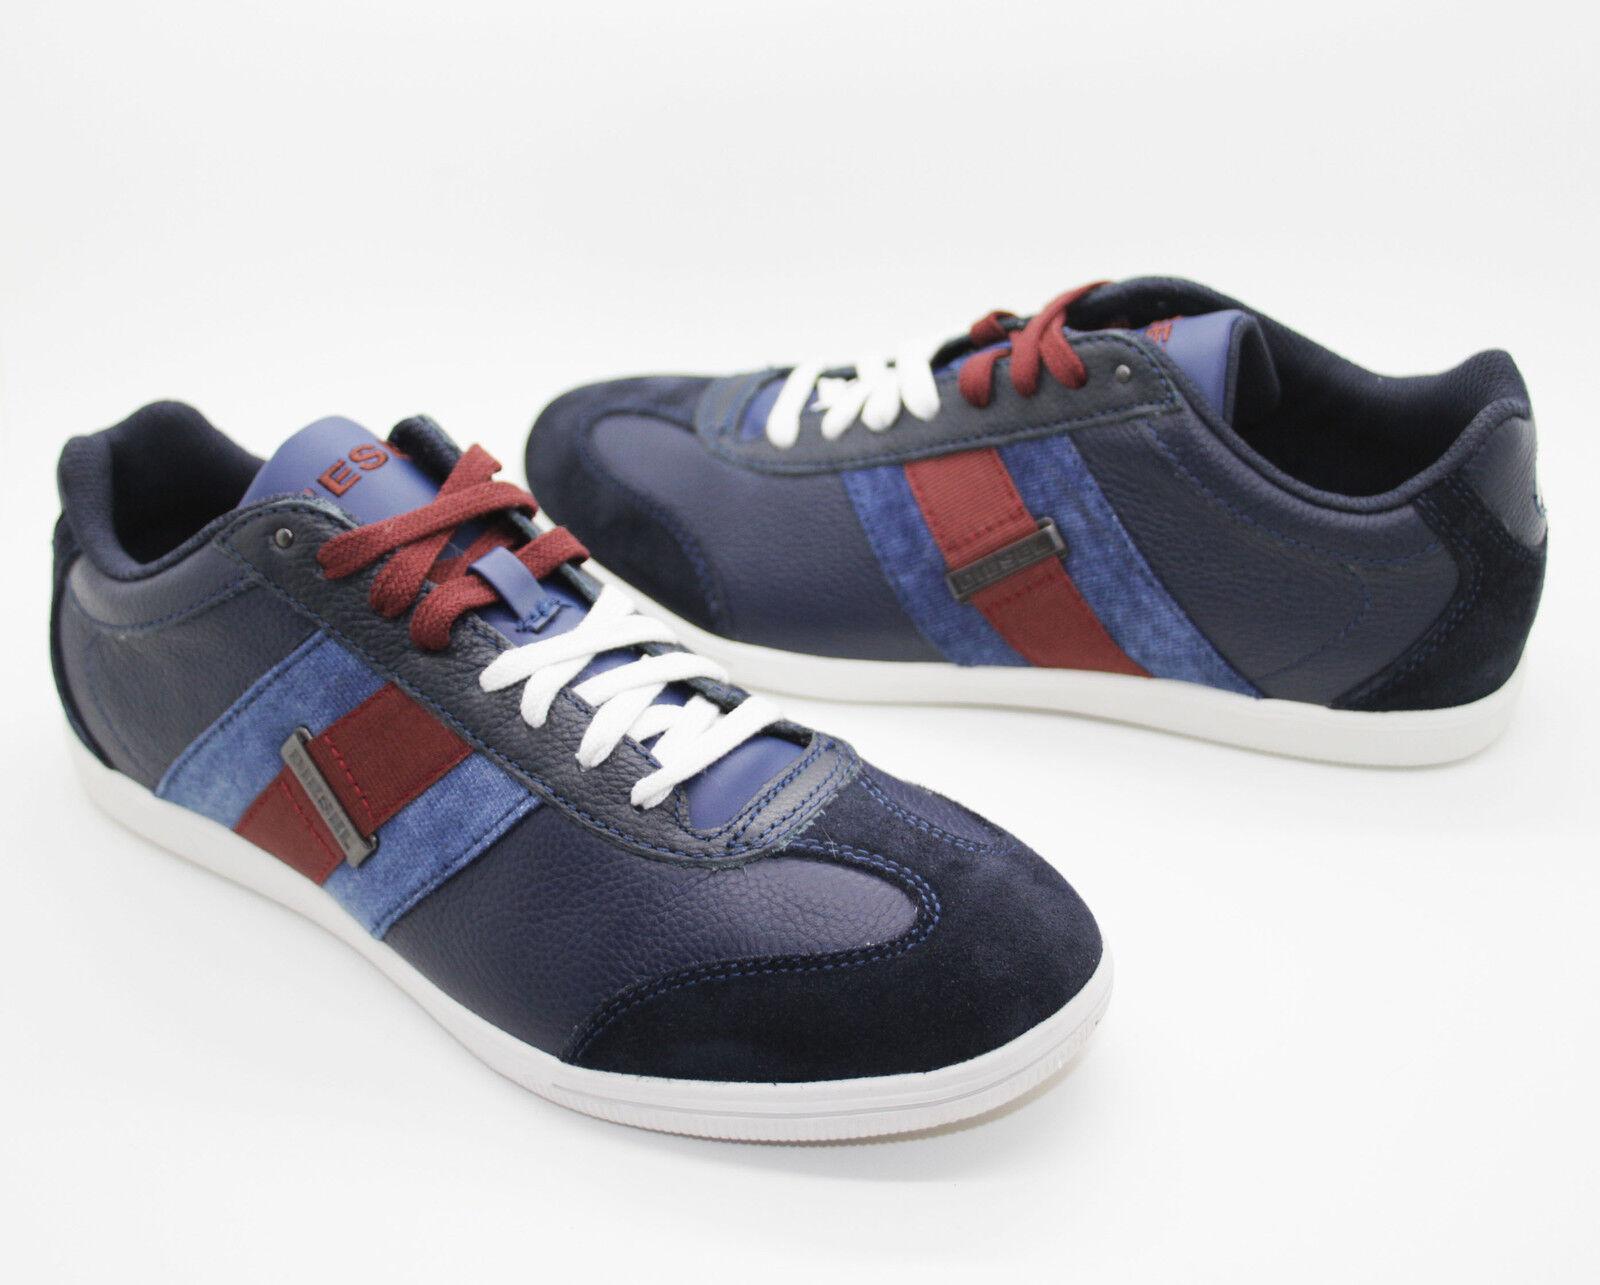 NIB DIESEL Men's Lounge bluee Night Fashion Casual Sport shoes Sneakers